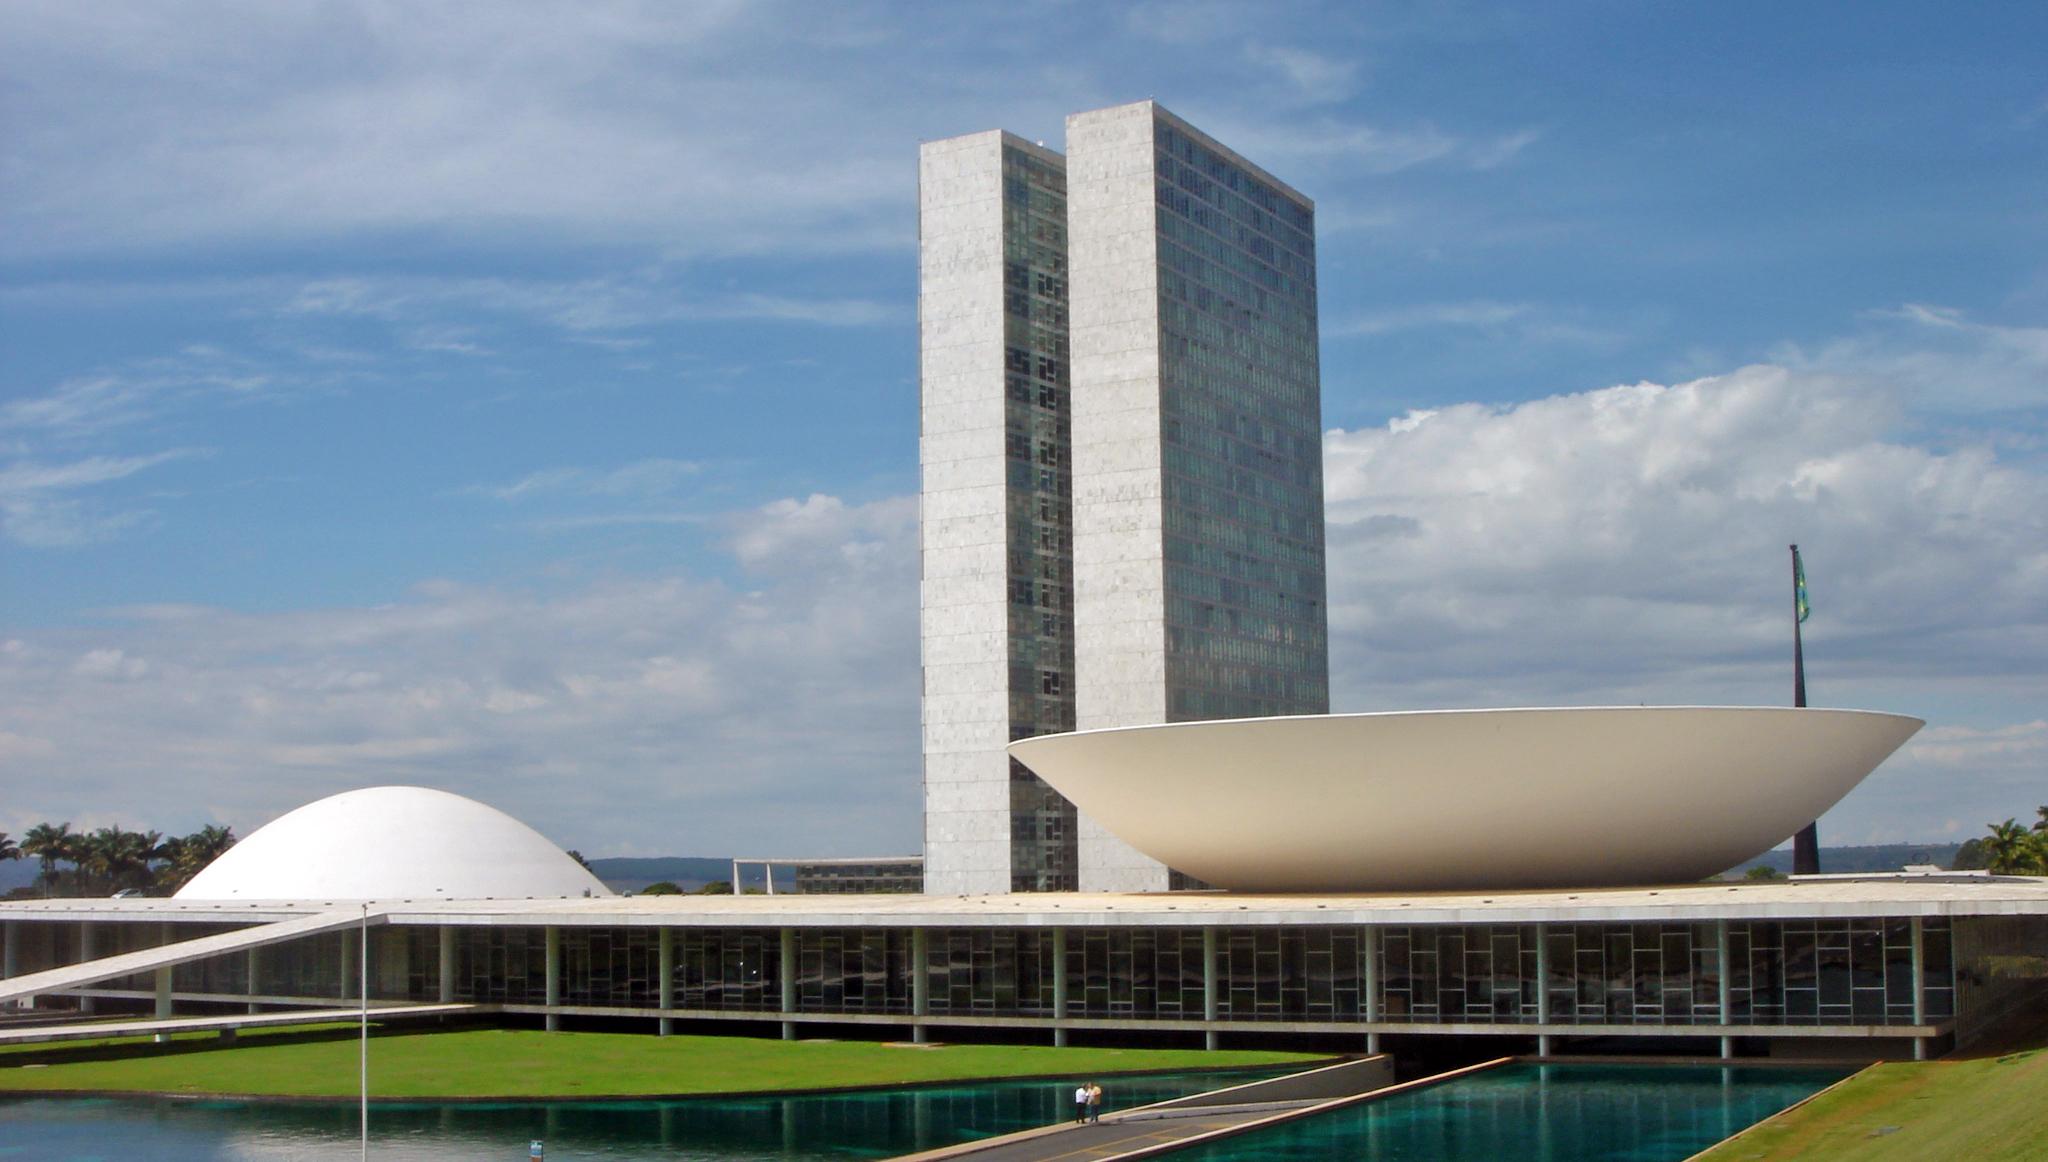 The National Congress of Brazil, Brasilia 1958. Image credit:  Wikipedia .